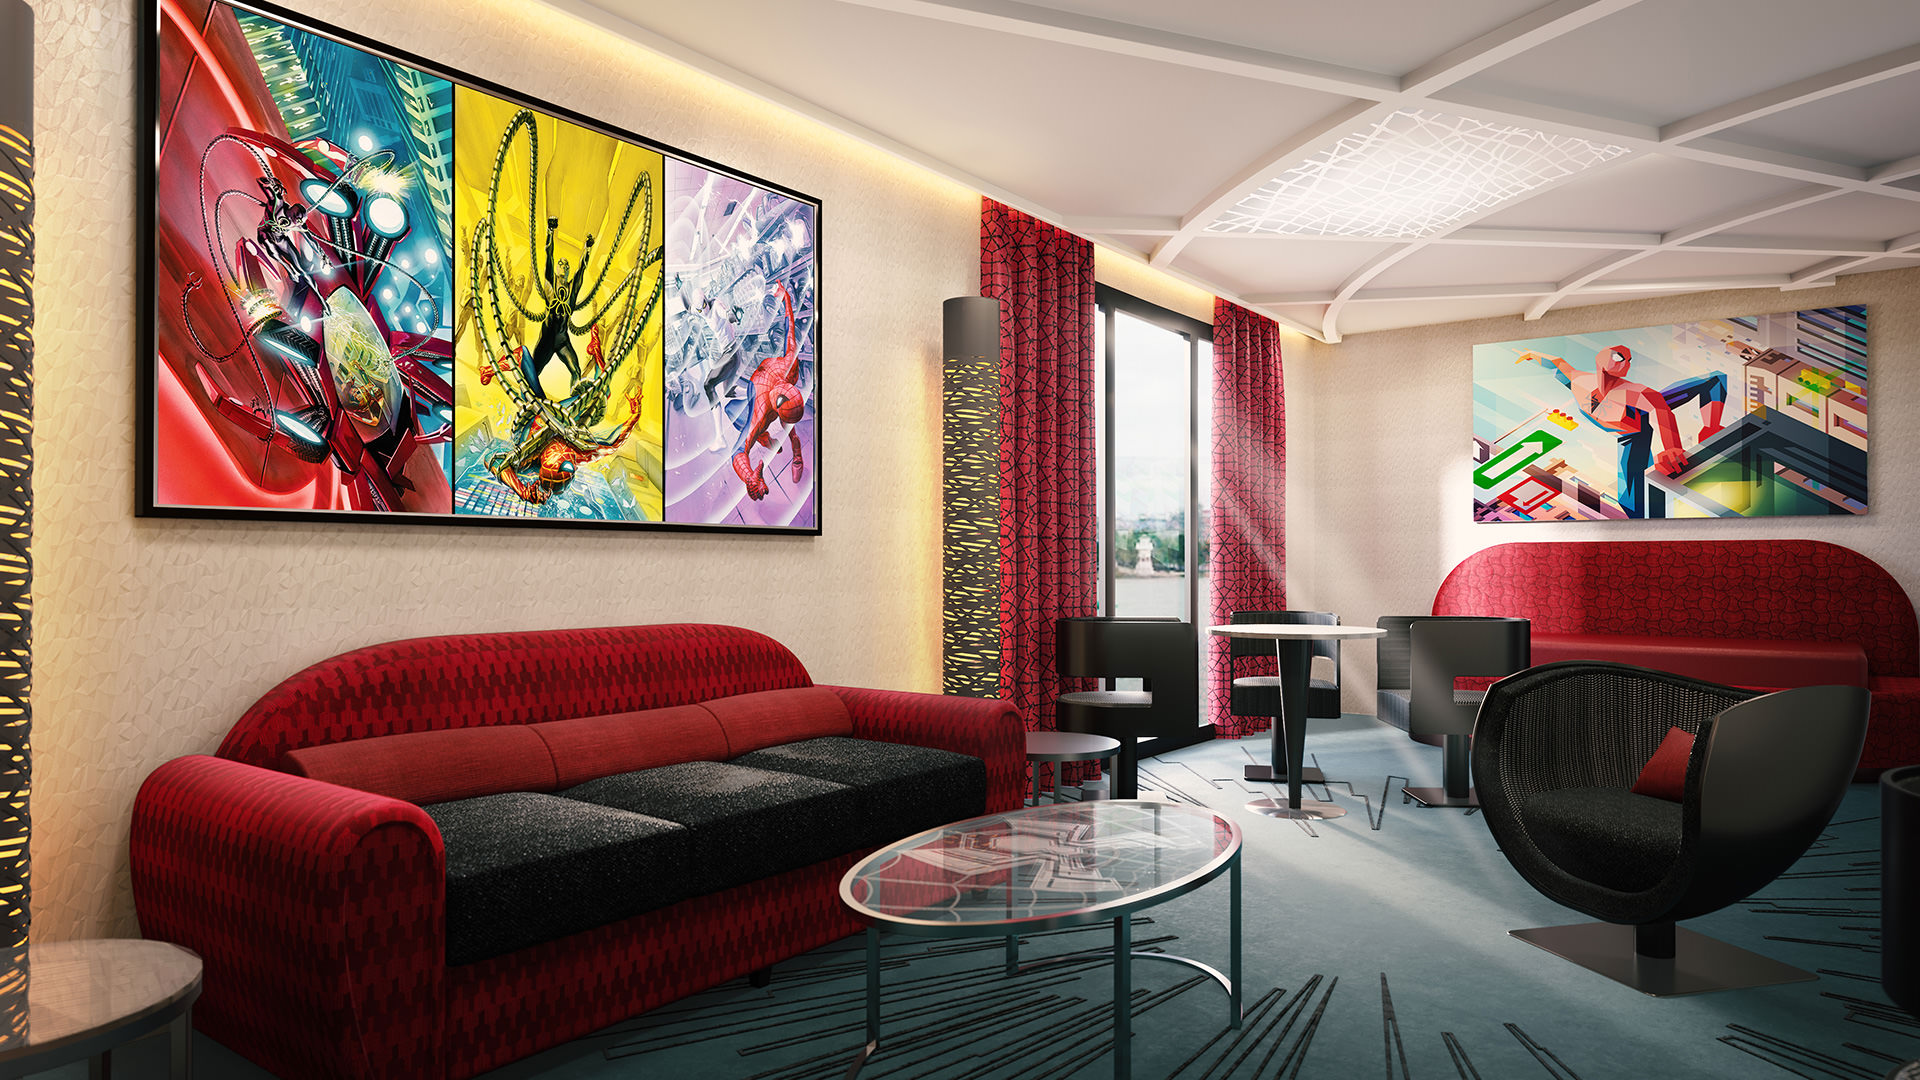 disneys-hotel-new-york-the-art-of-marvel-suite-spiderman